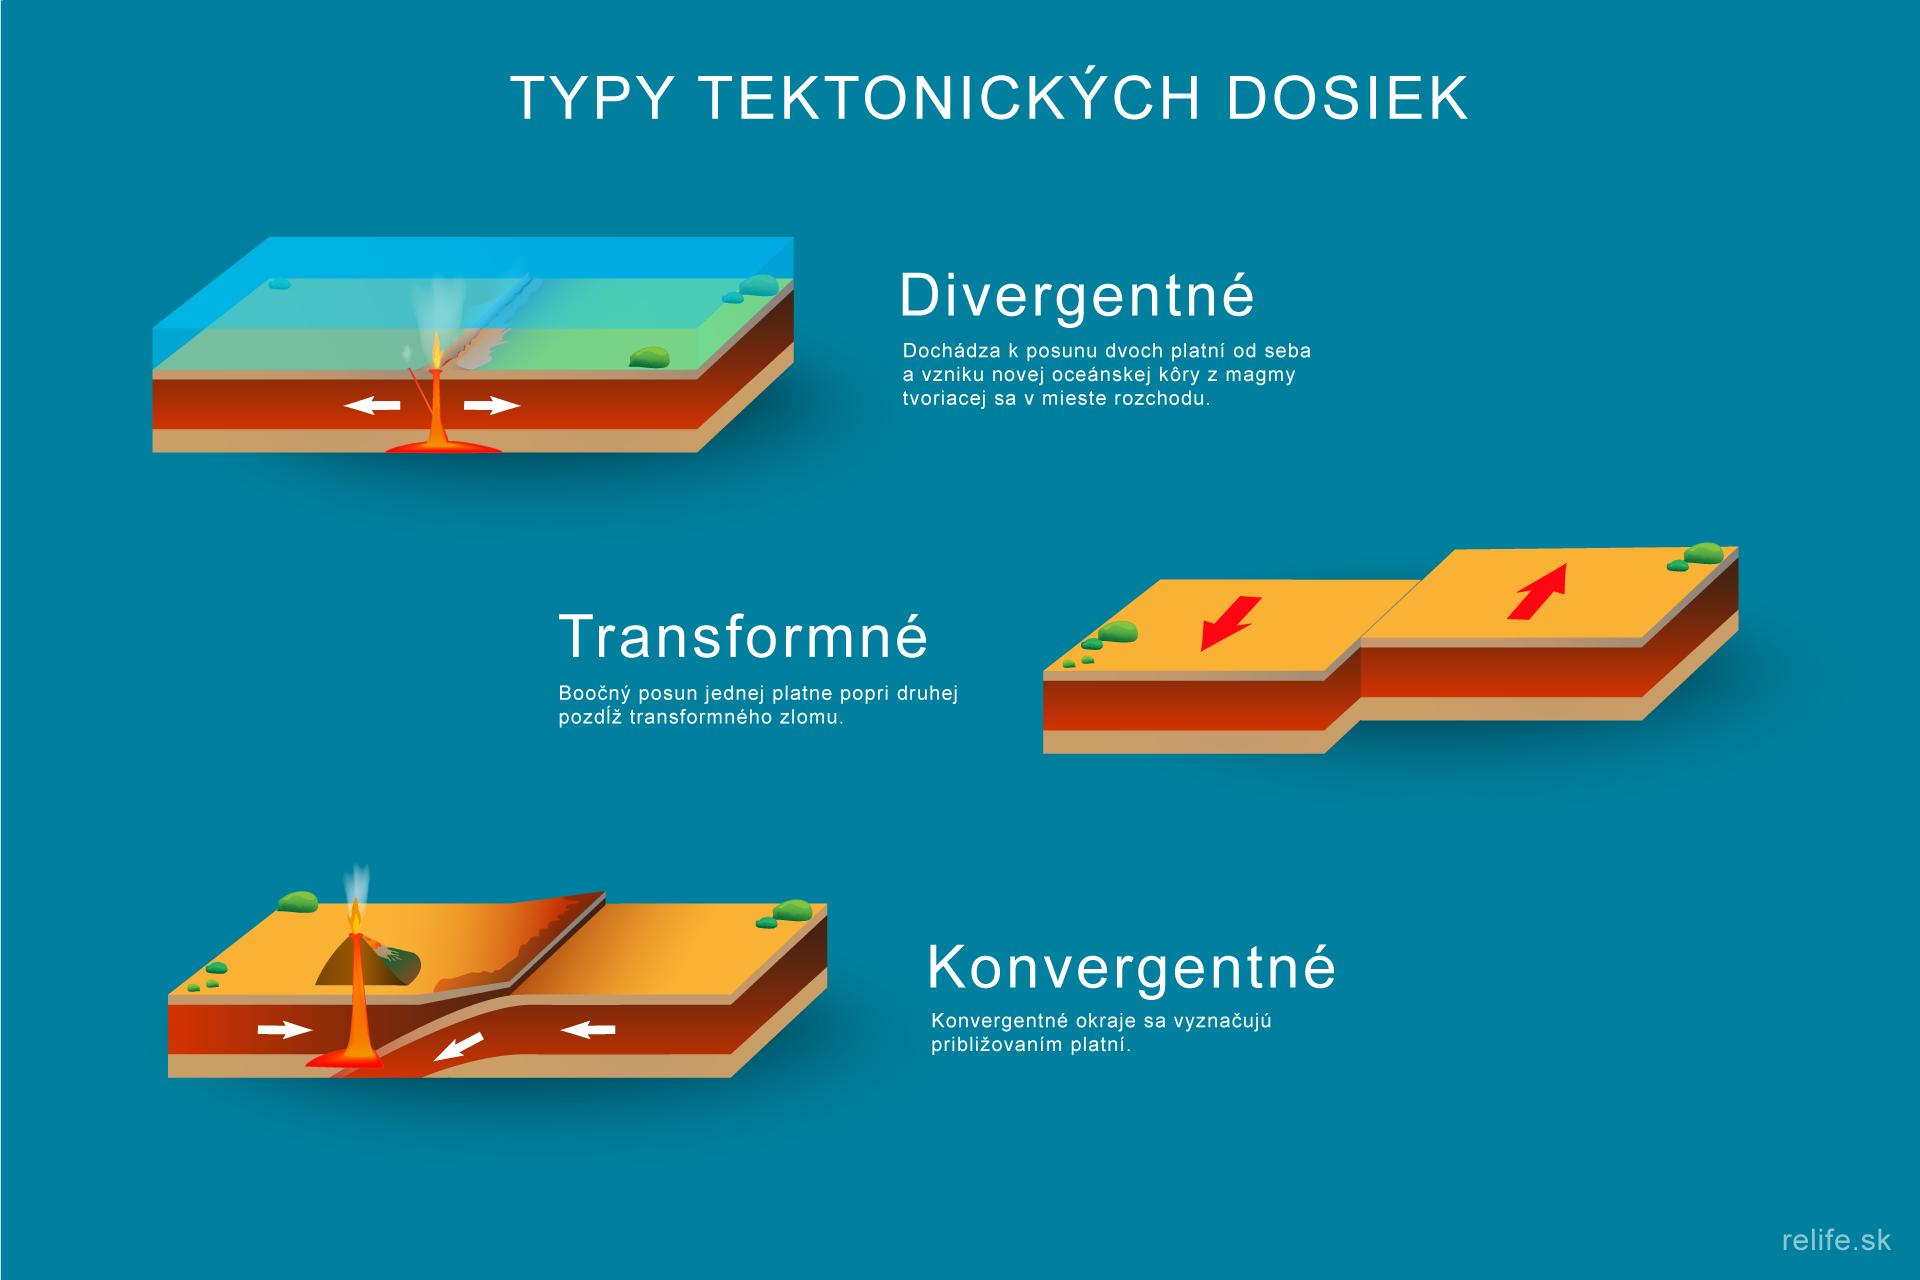 Typy tektonických dosiek